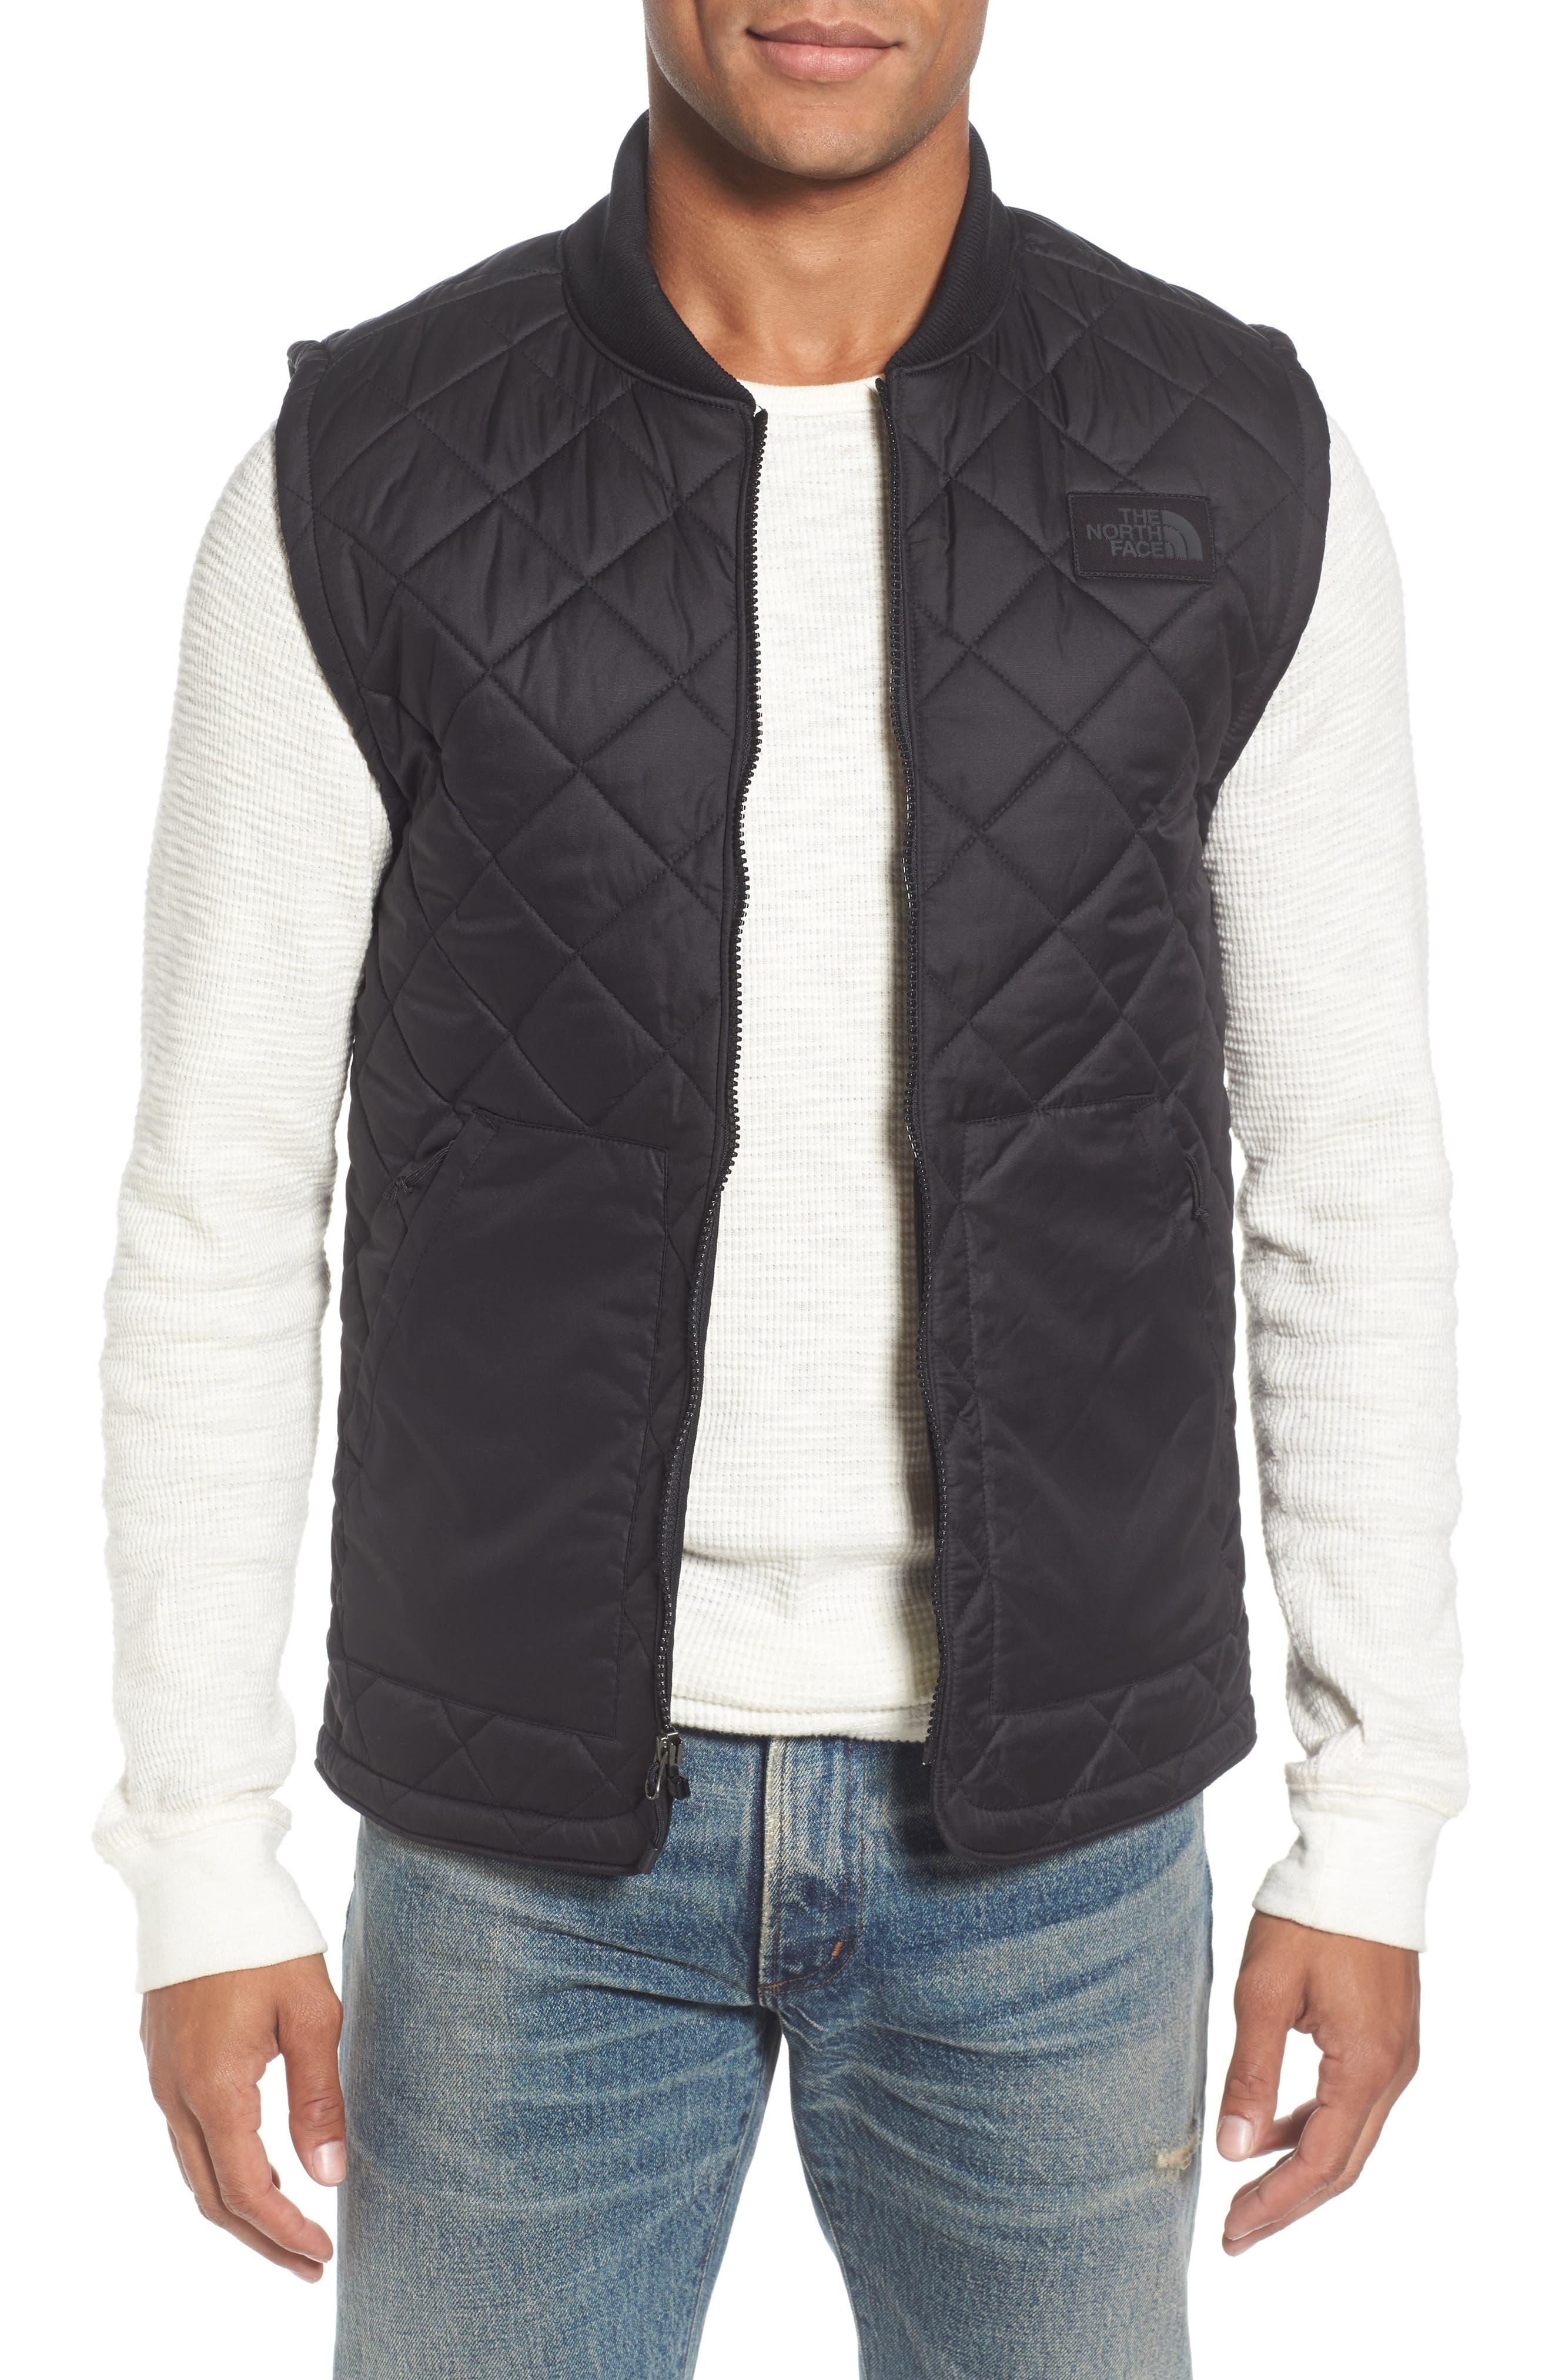 Cuchillo Insulated Vest,                             Main thumbnail 1, color,                             001